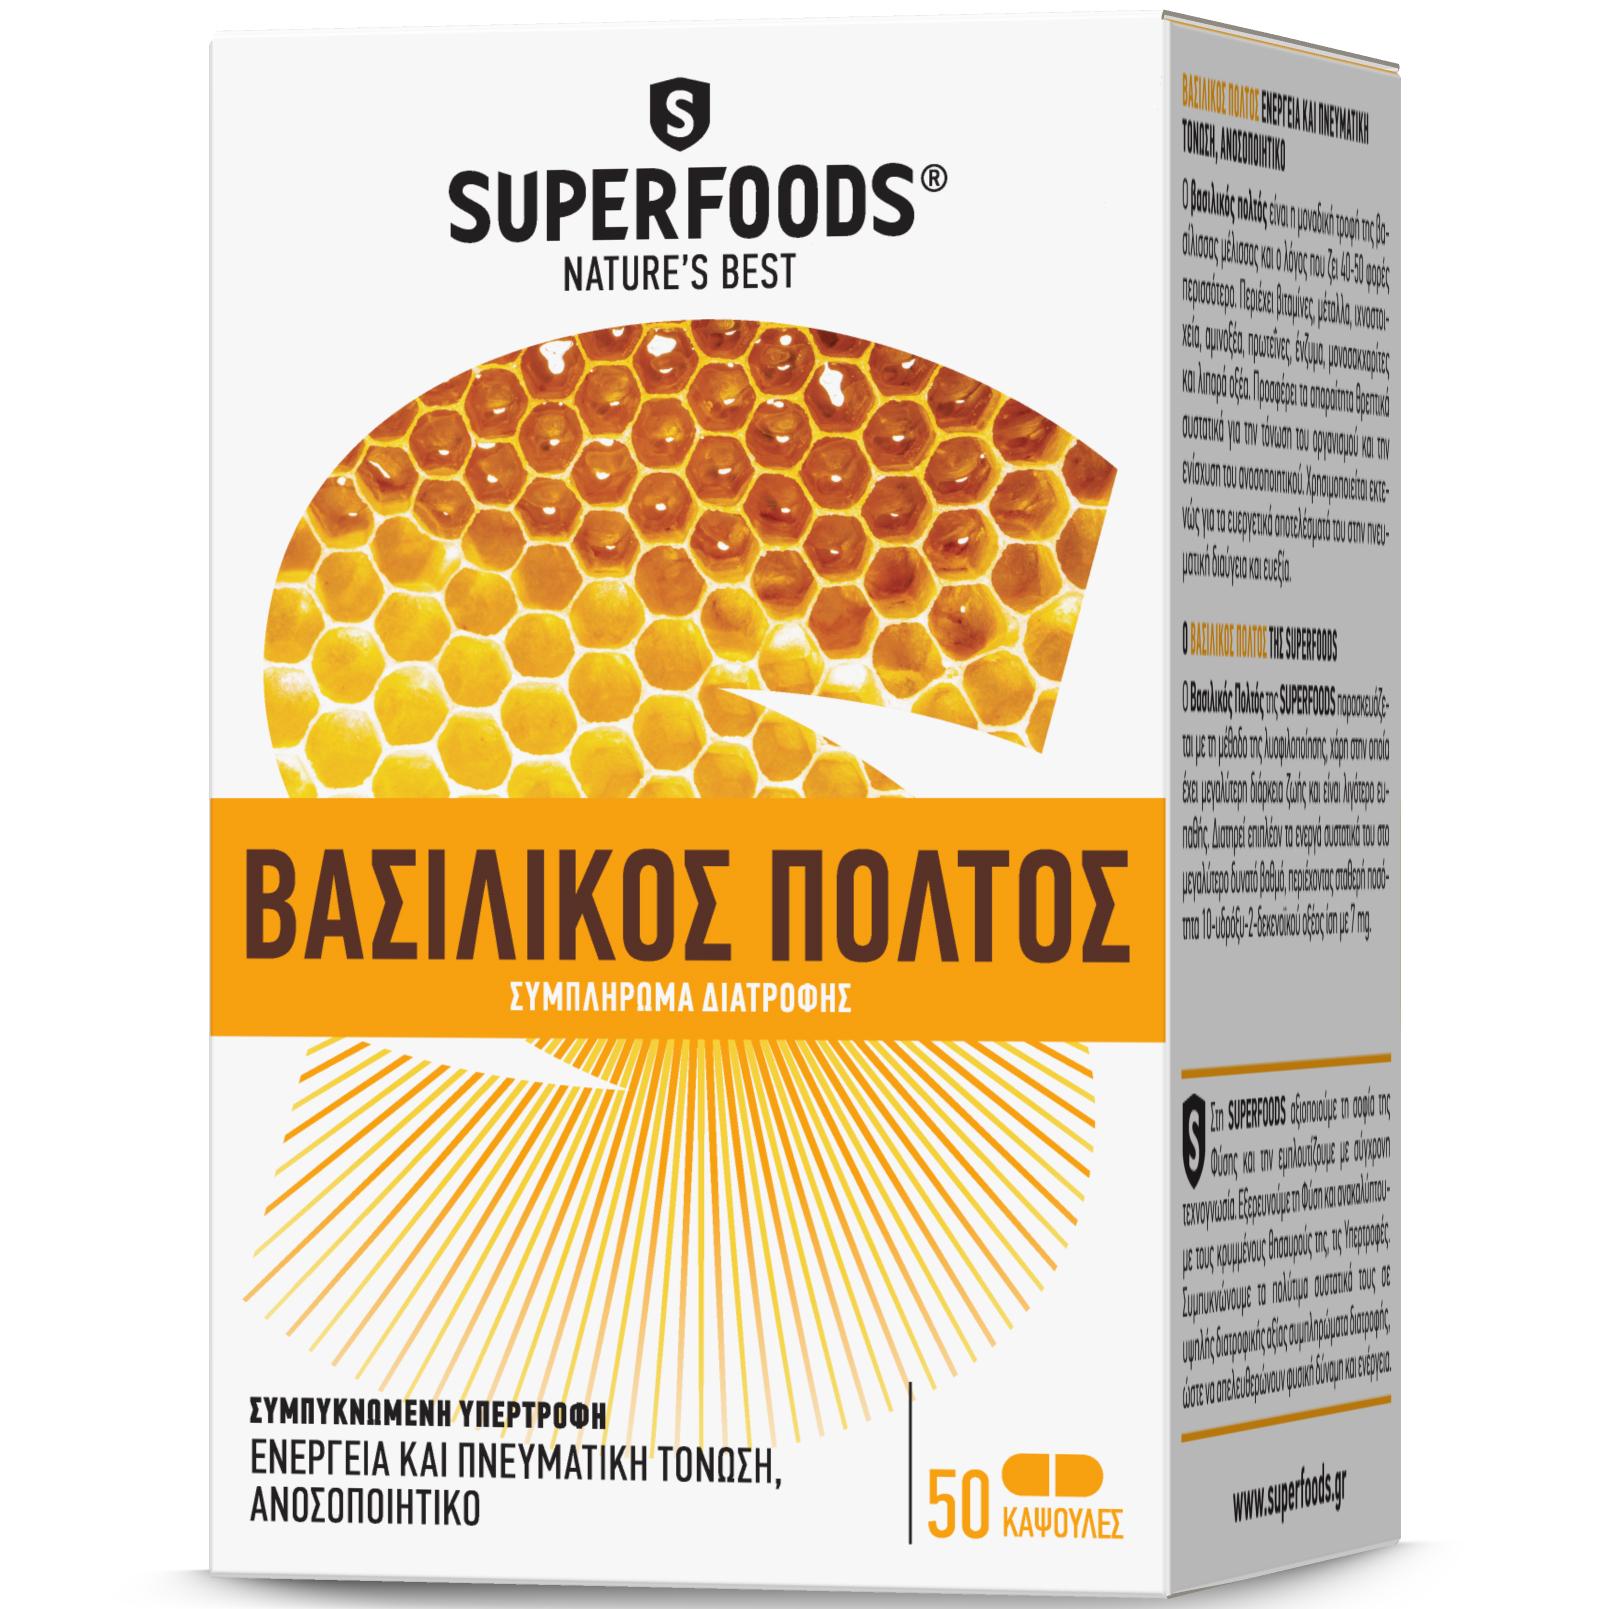 SuperfoodsΒασιλικός Πολτός Συμπλήρωμα Διατροφήςγια Σωματική & Πνευματική Τόνωση 50tabs